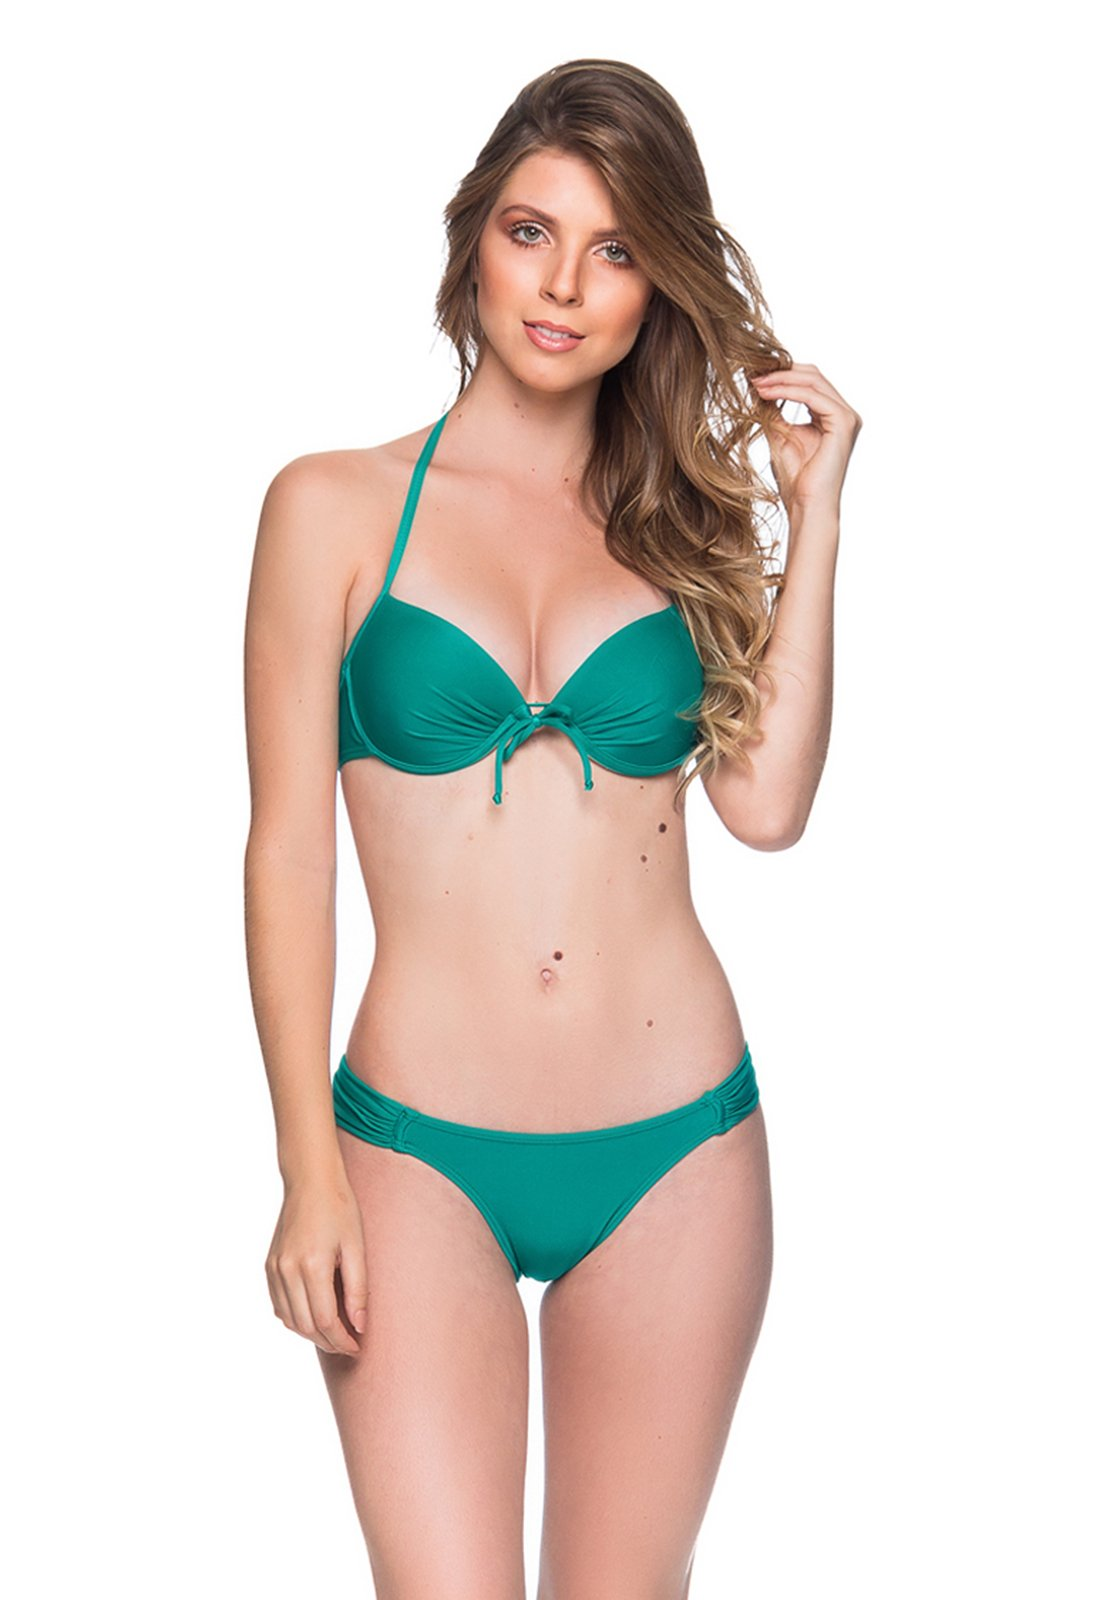 7a9d2d20fc Green Underwired Push-up Balconette Bikini - Bolha Arquipelago - La Playa